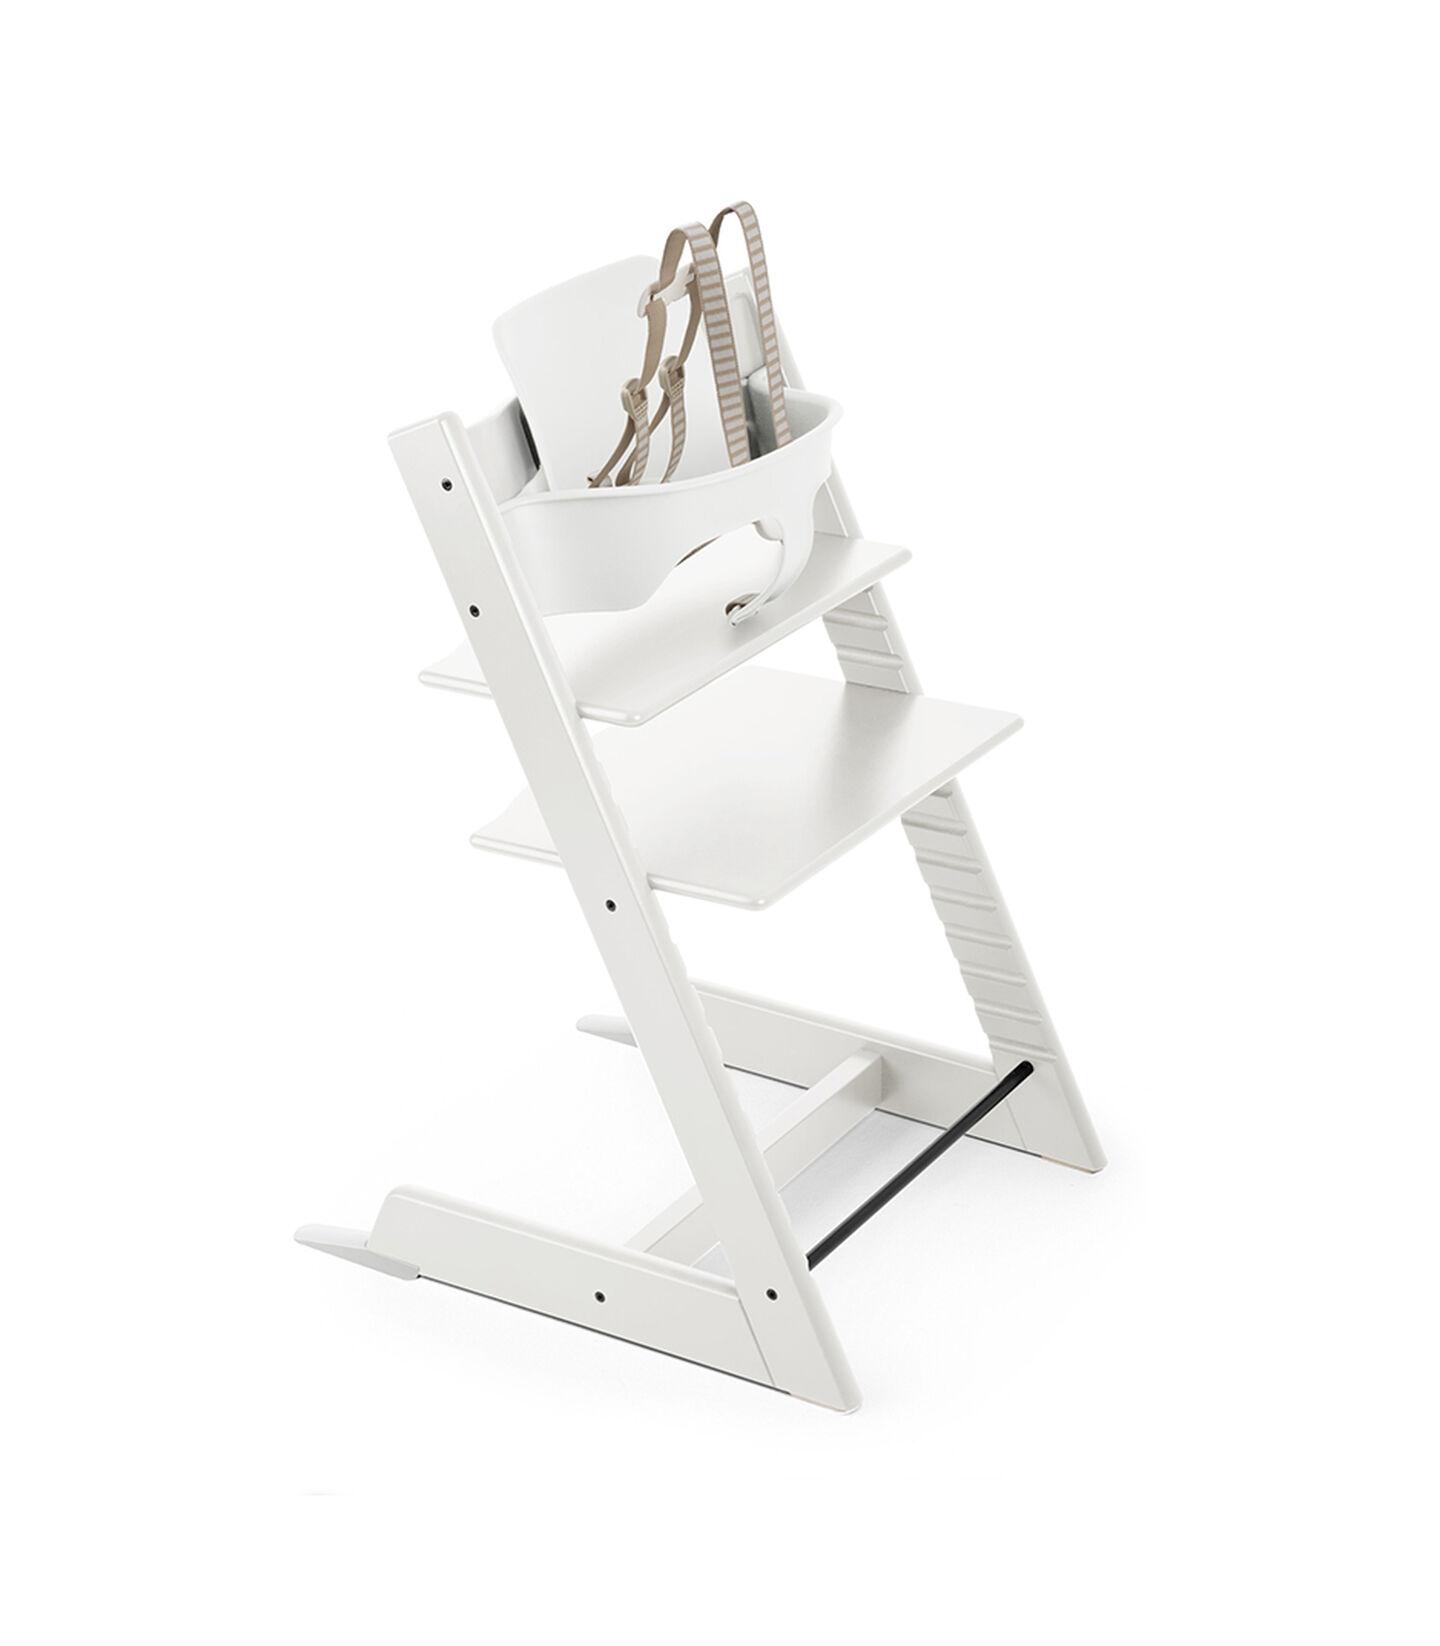 Tripp Trapp® Baby Set Blanco, Blanco, mainview view 2